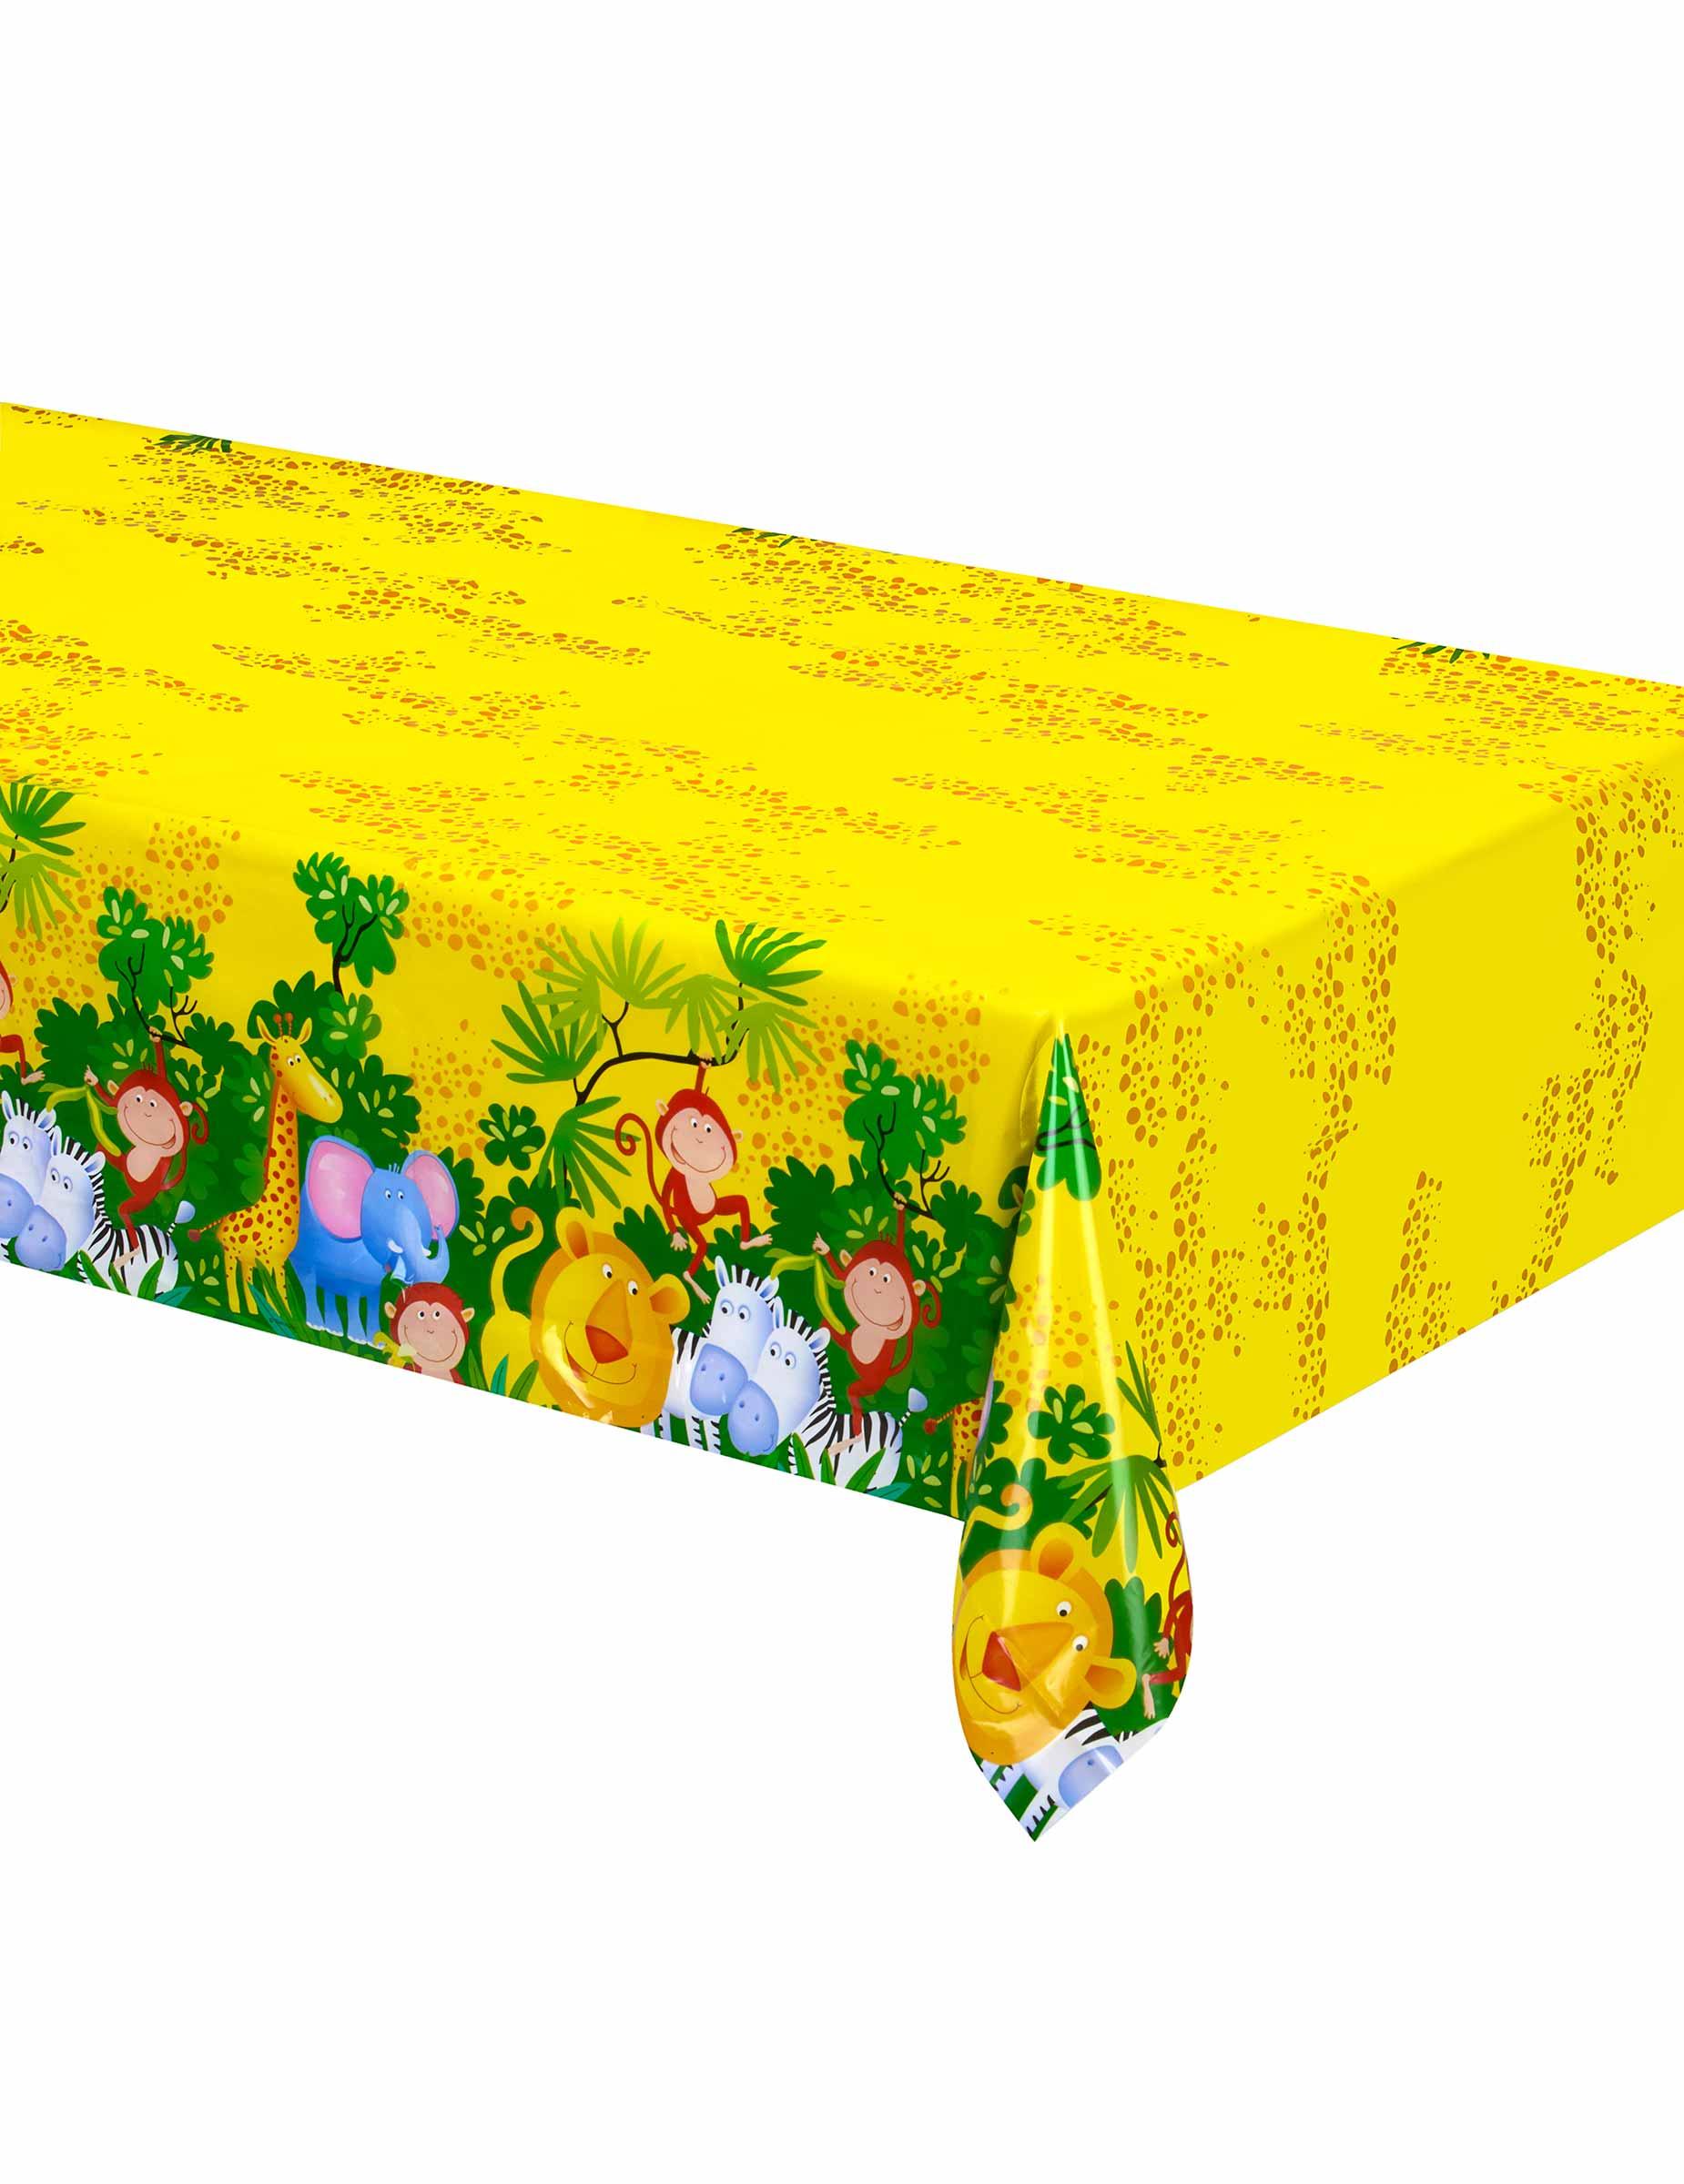 tischdecke safari kindergeburtstag deko bunt 130x180cm. Black Bedroom Furniture Sets. Home Design Ideas